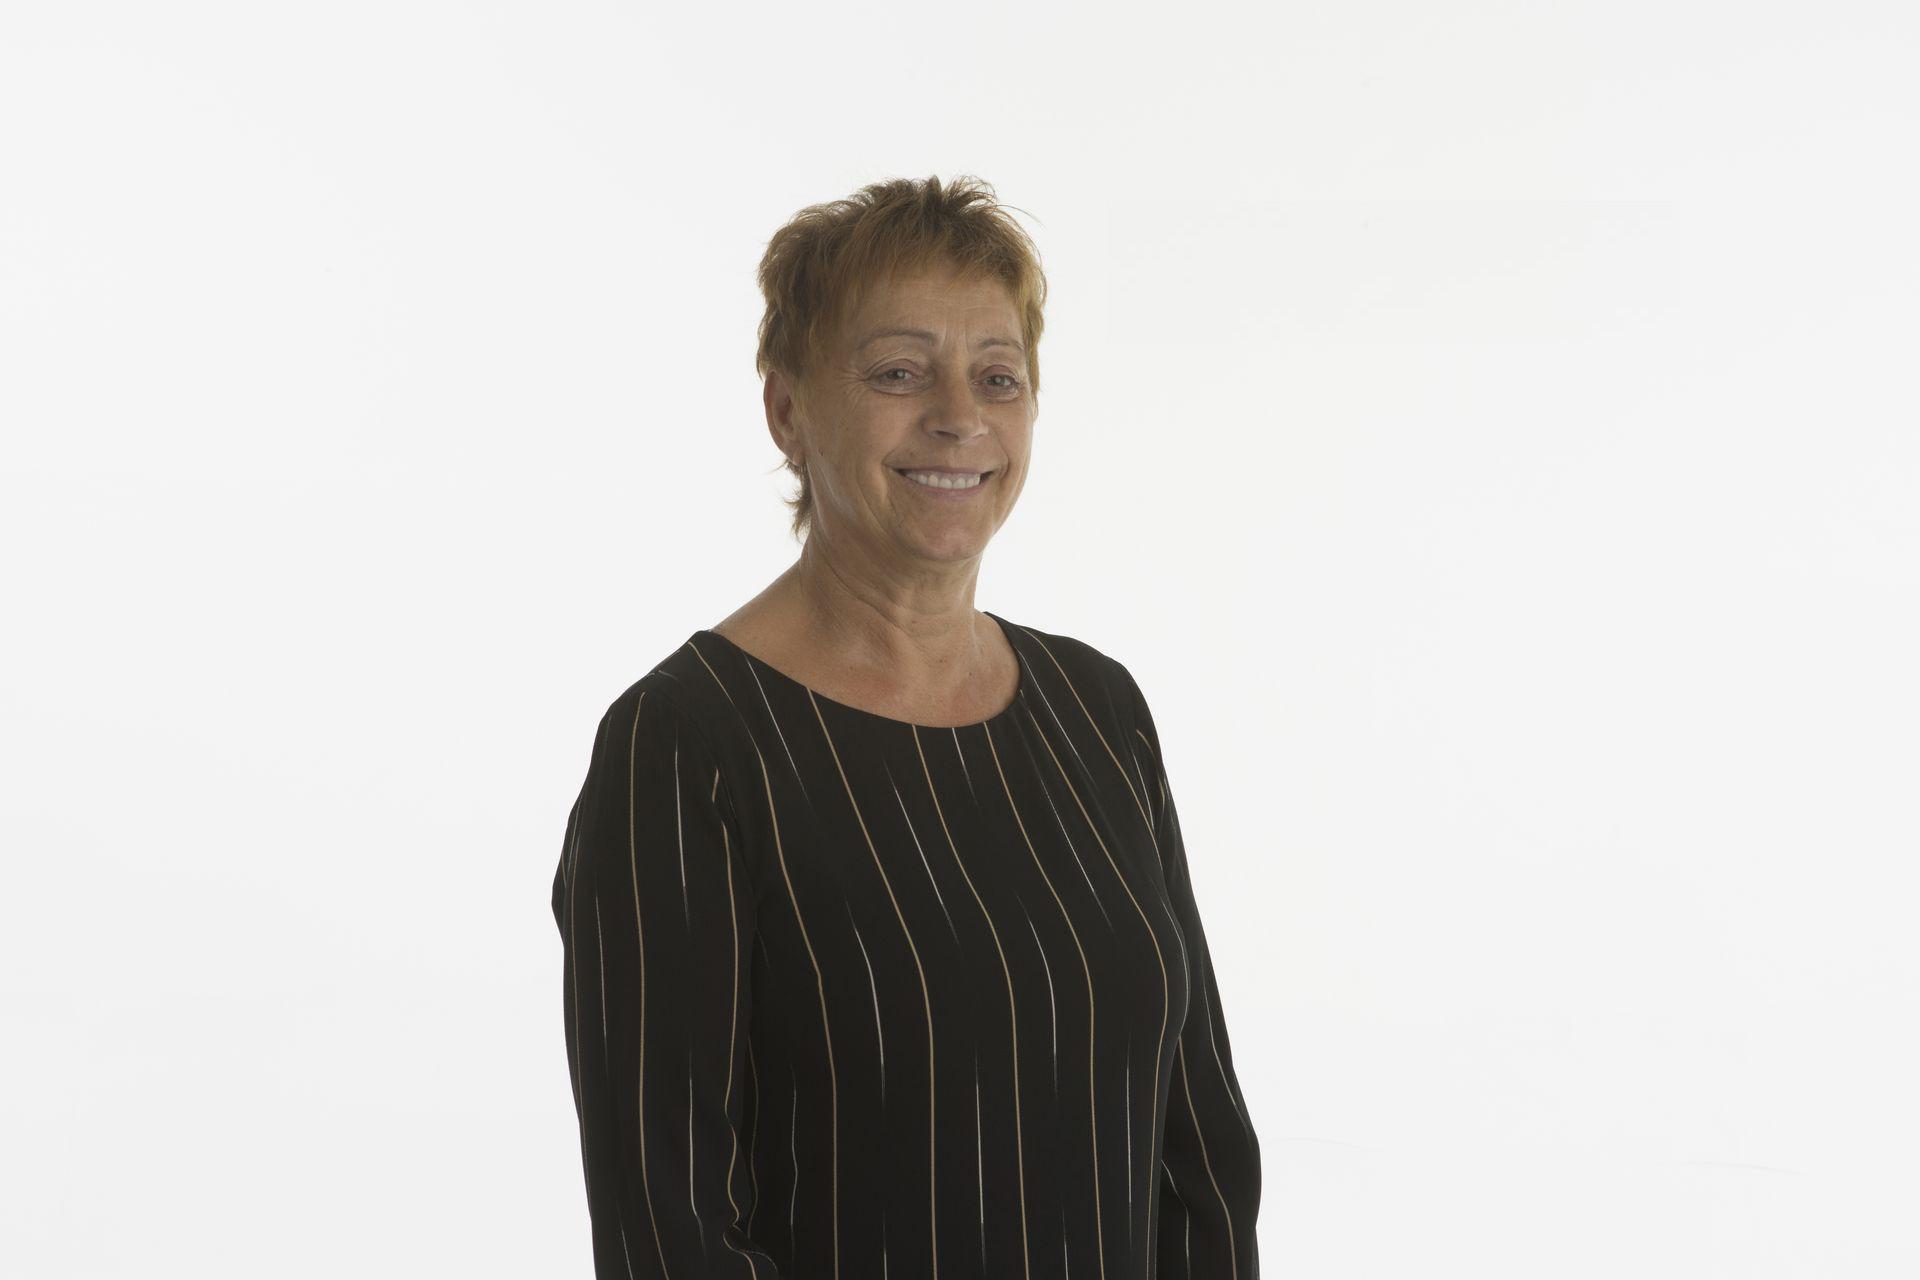 Jennemie Dauwen